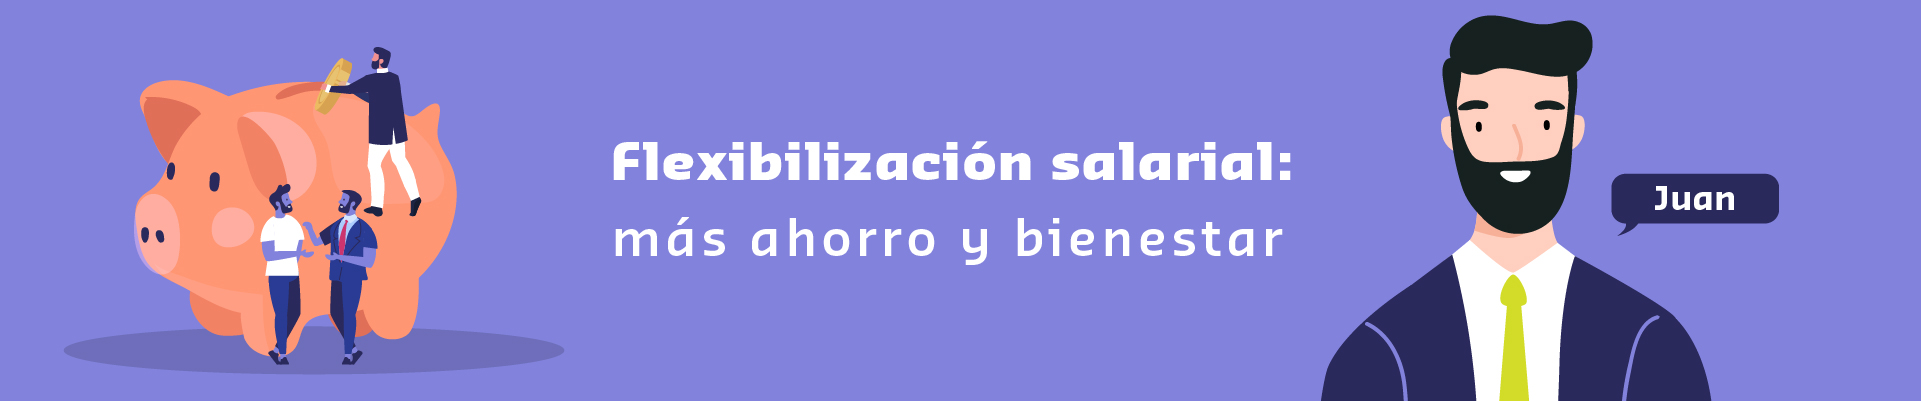 banner-flexibilizacion-salarial-100